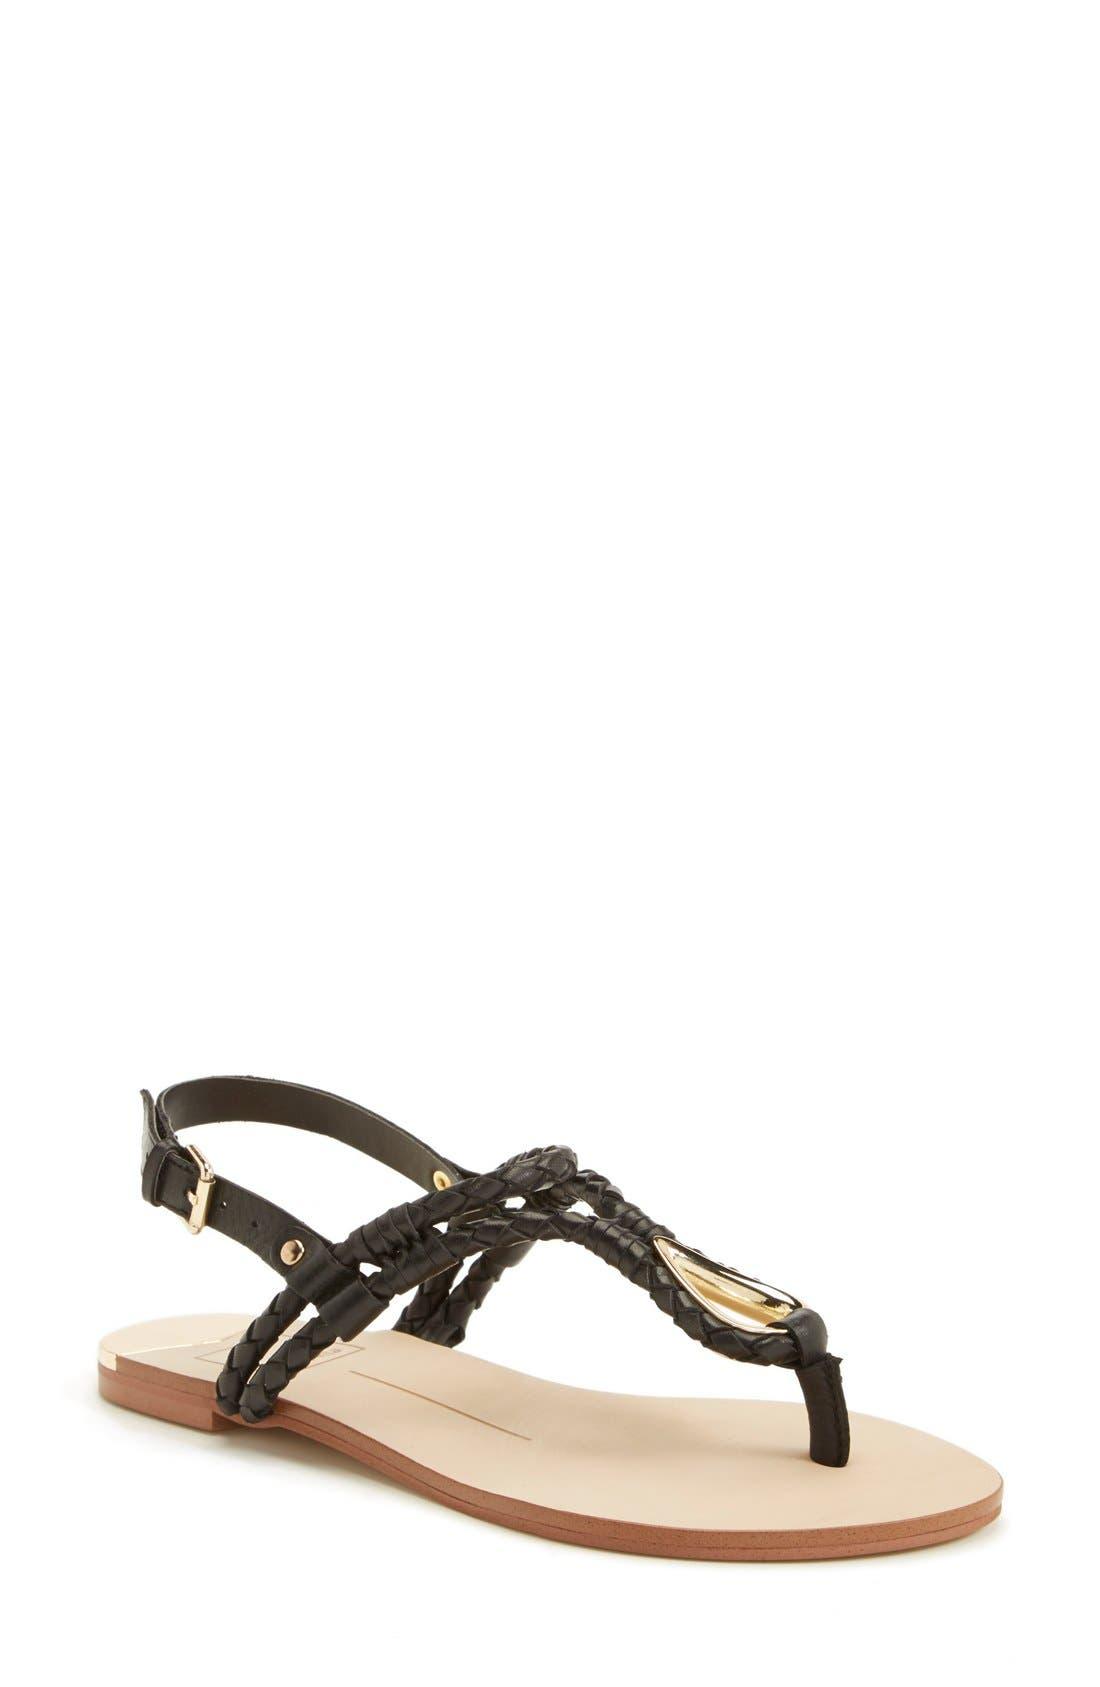 'Dixin' Thong Sandal,                         Main,                         color, 004